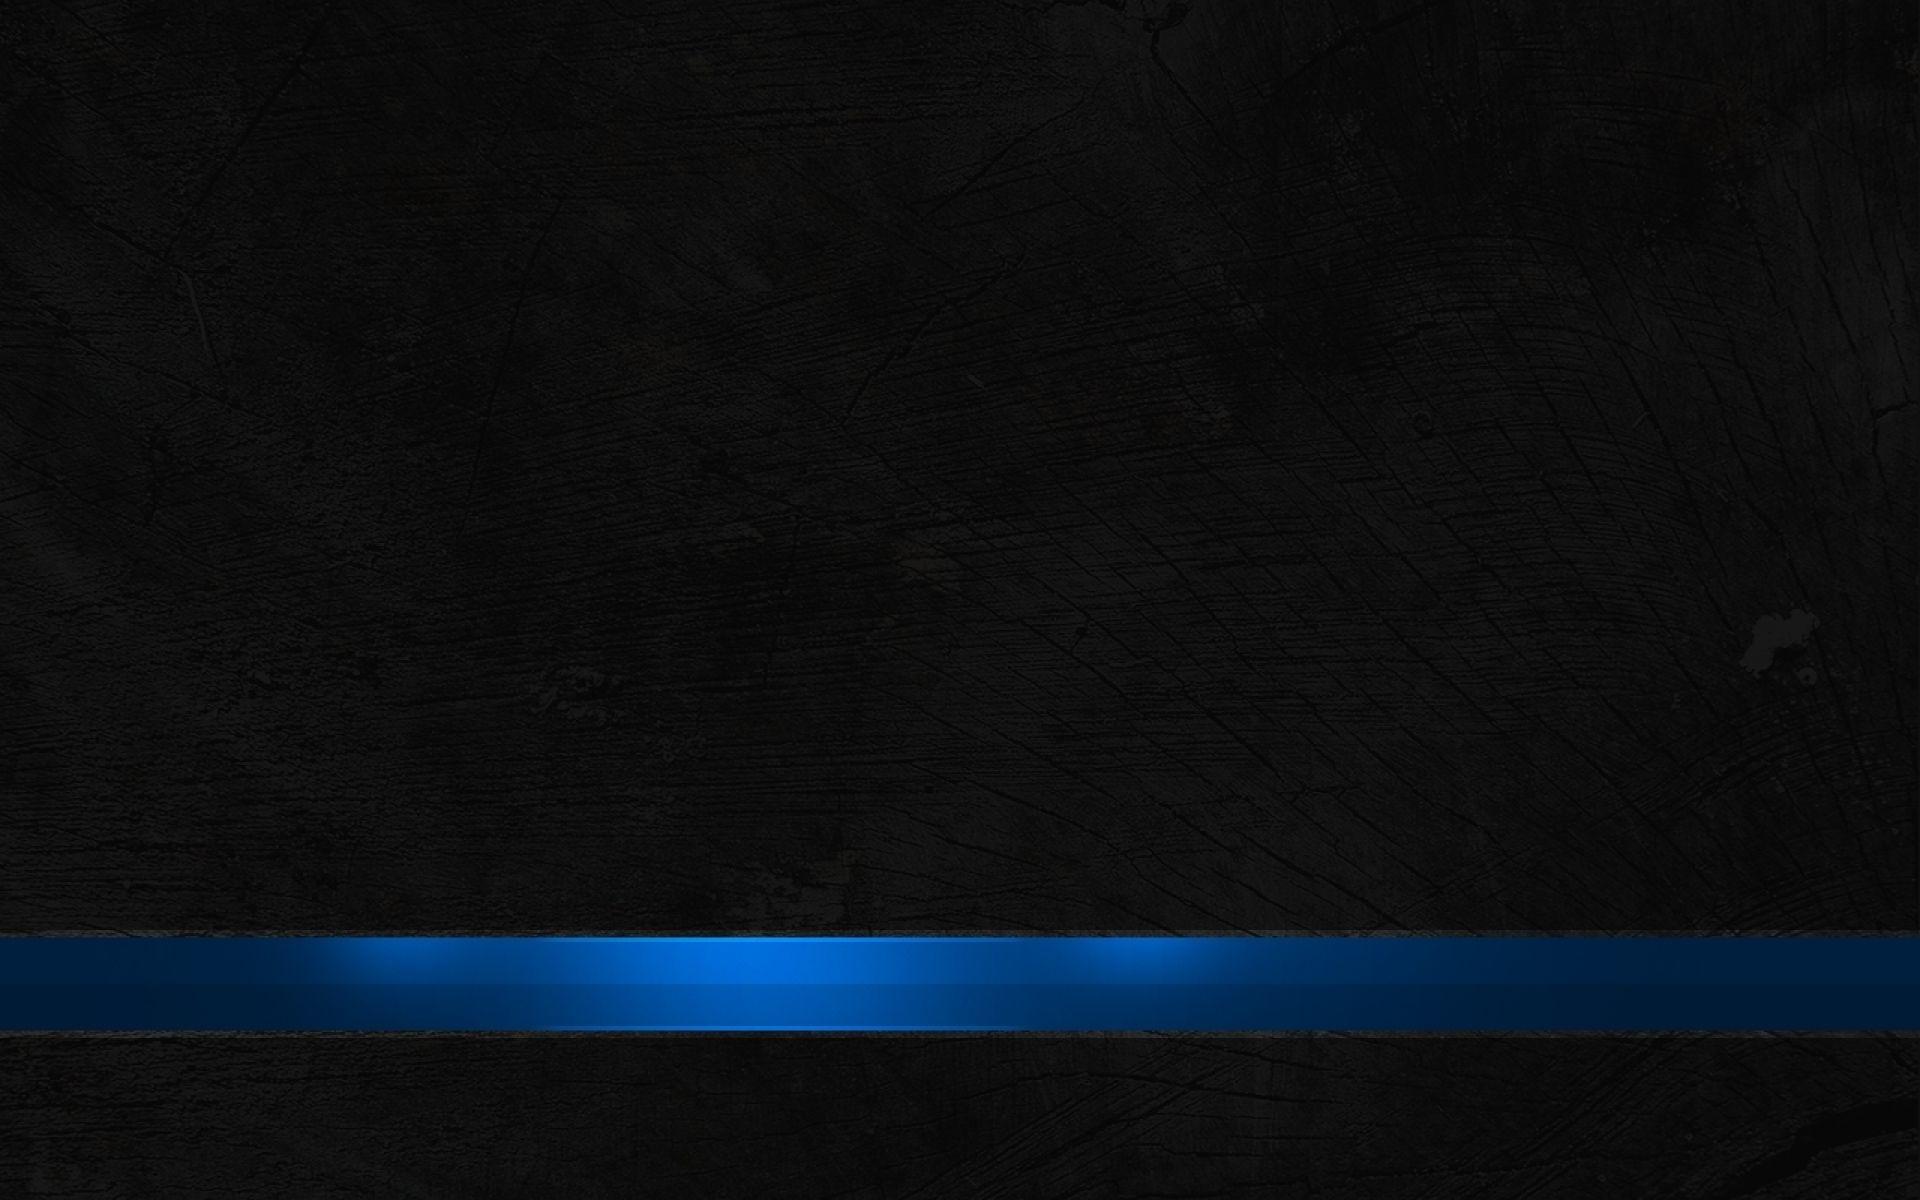 Black Blue Wallpaper Hd Sf Wallpaper